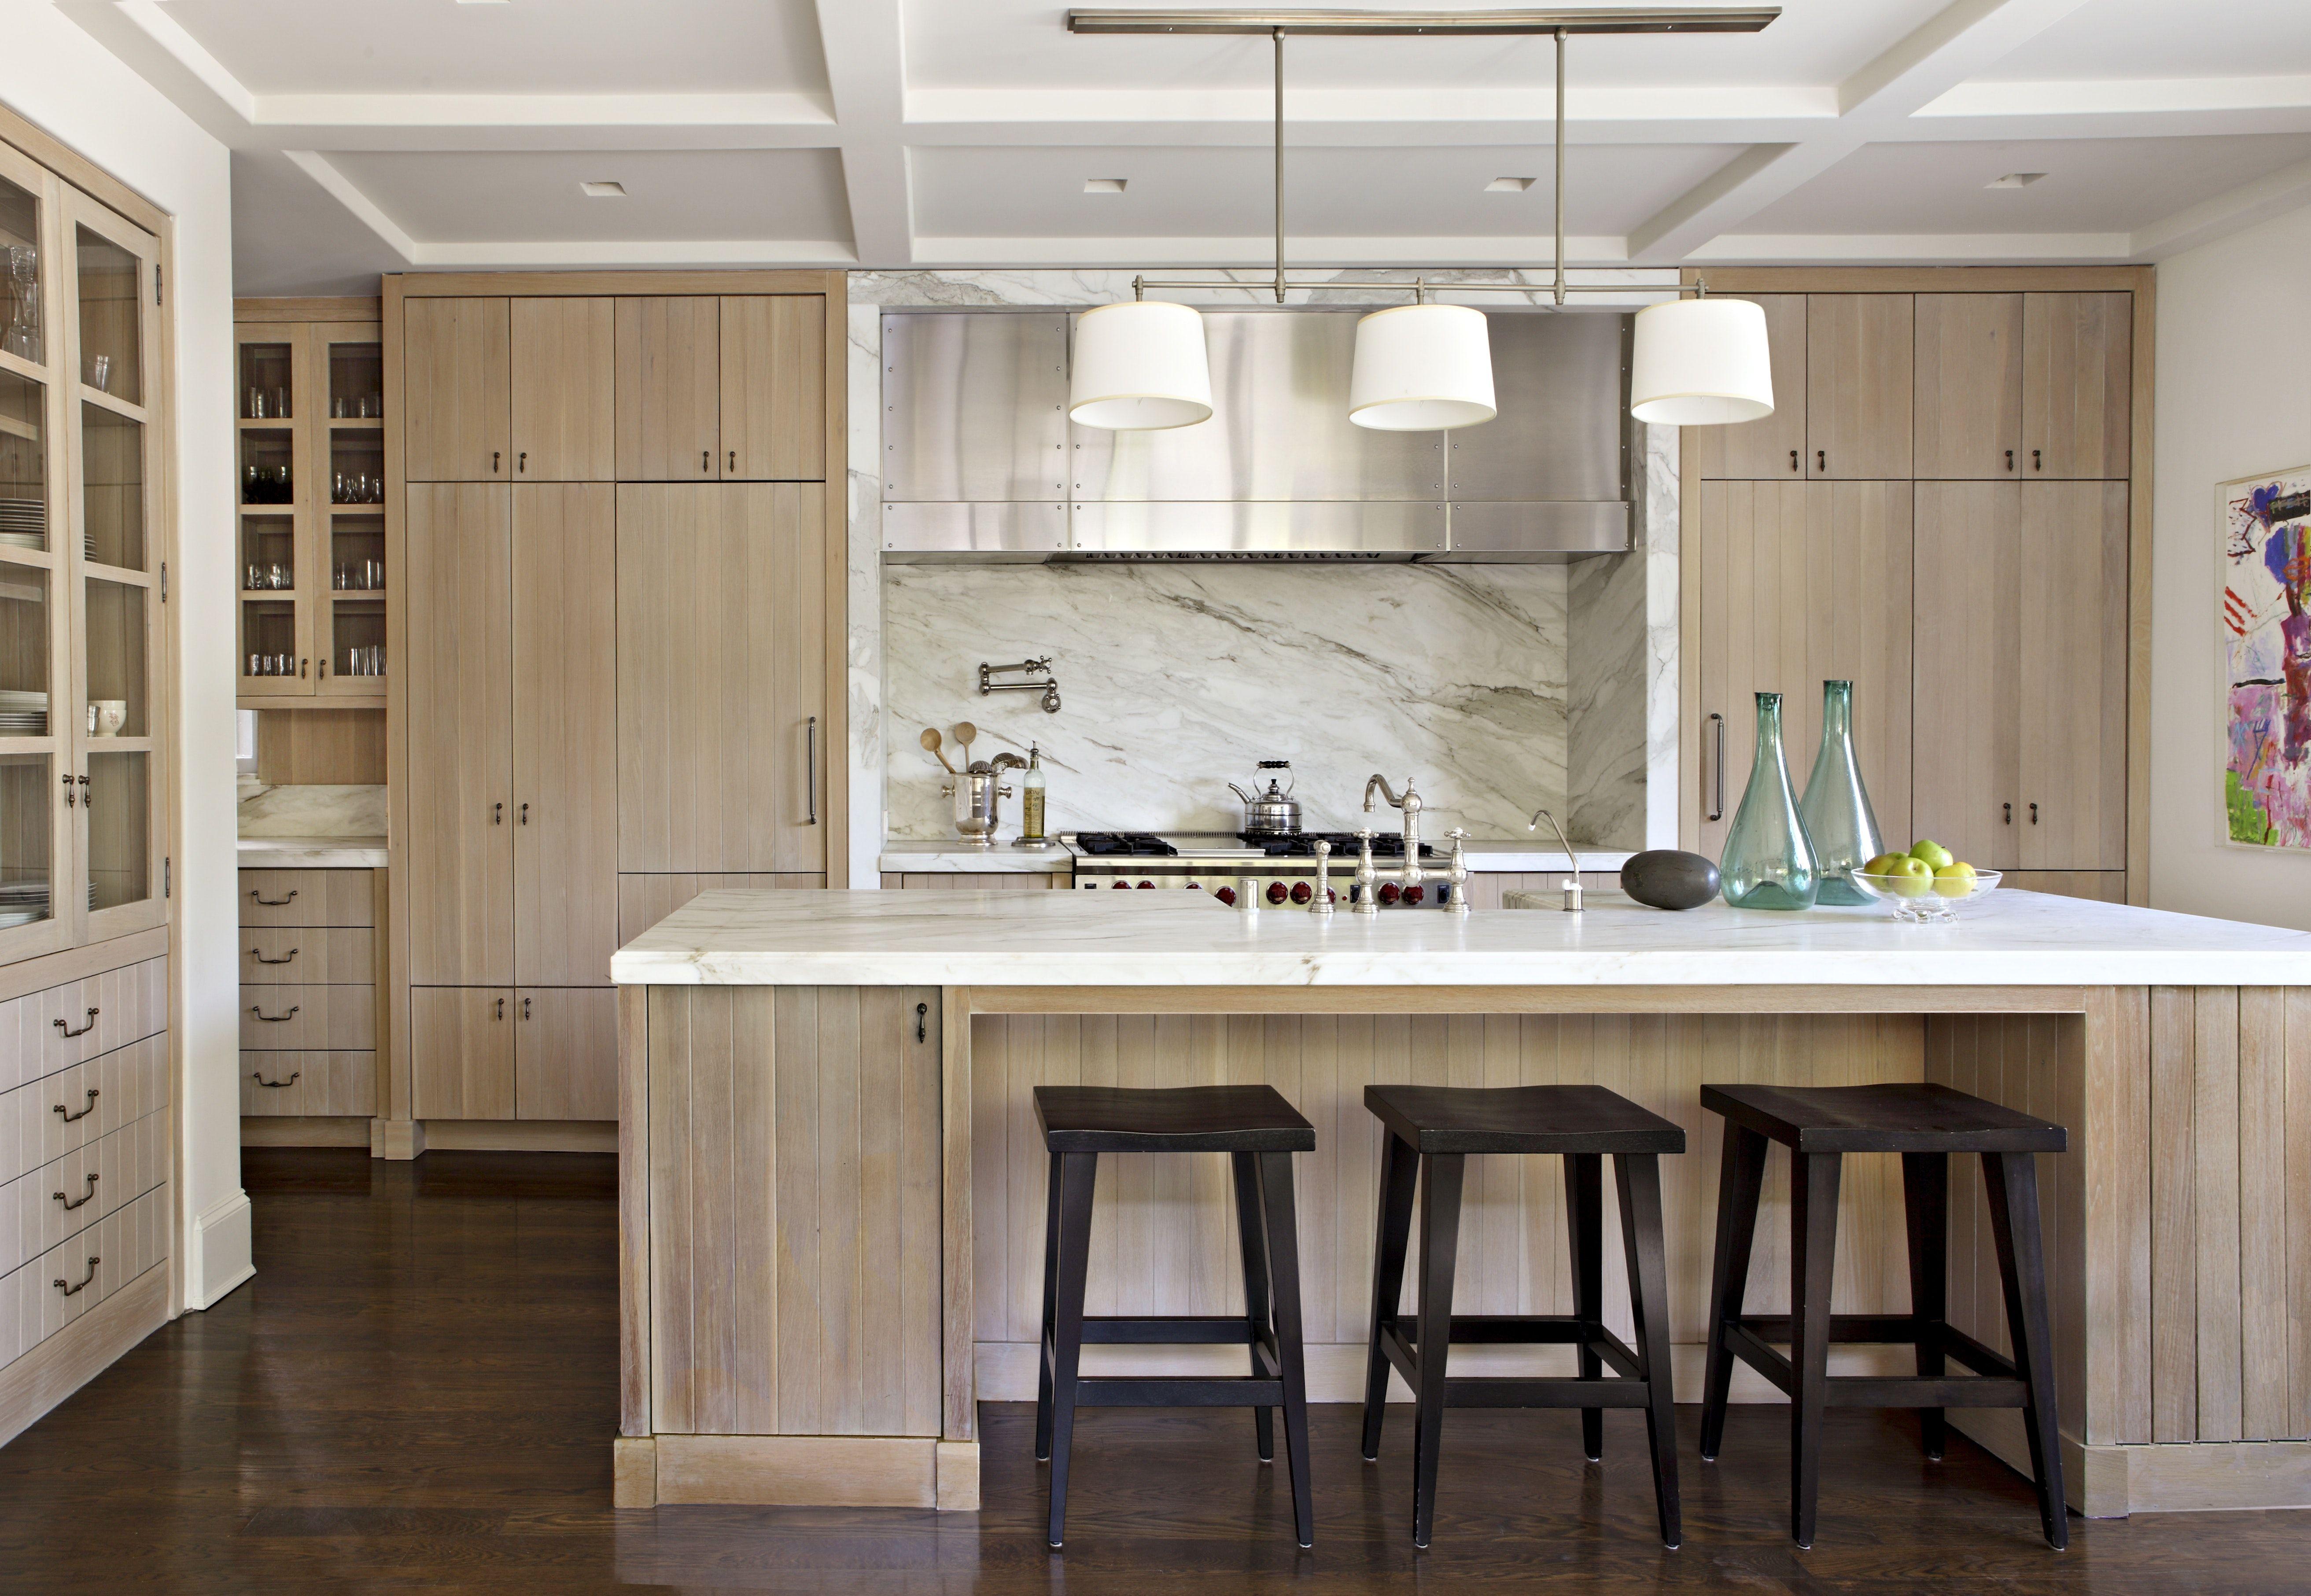 Hancock Park Residence Wooden Kitchen Cabinets Light Wood Kitchens Wood Kitchen